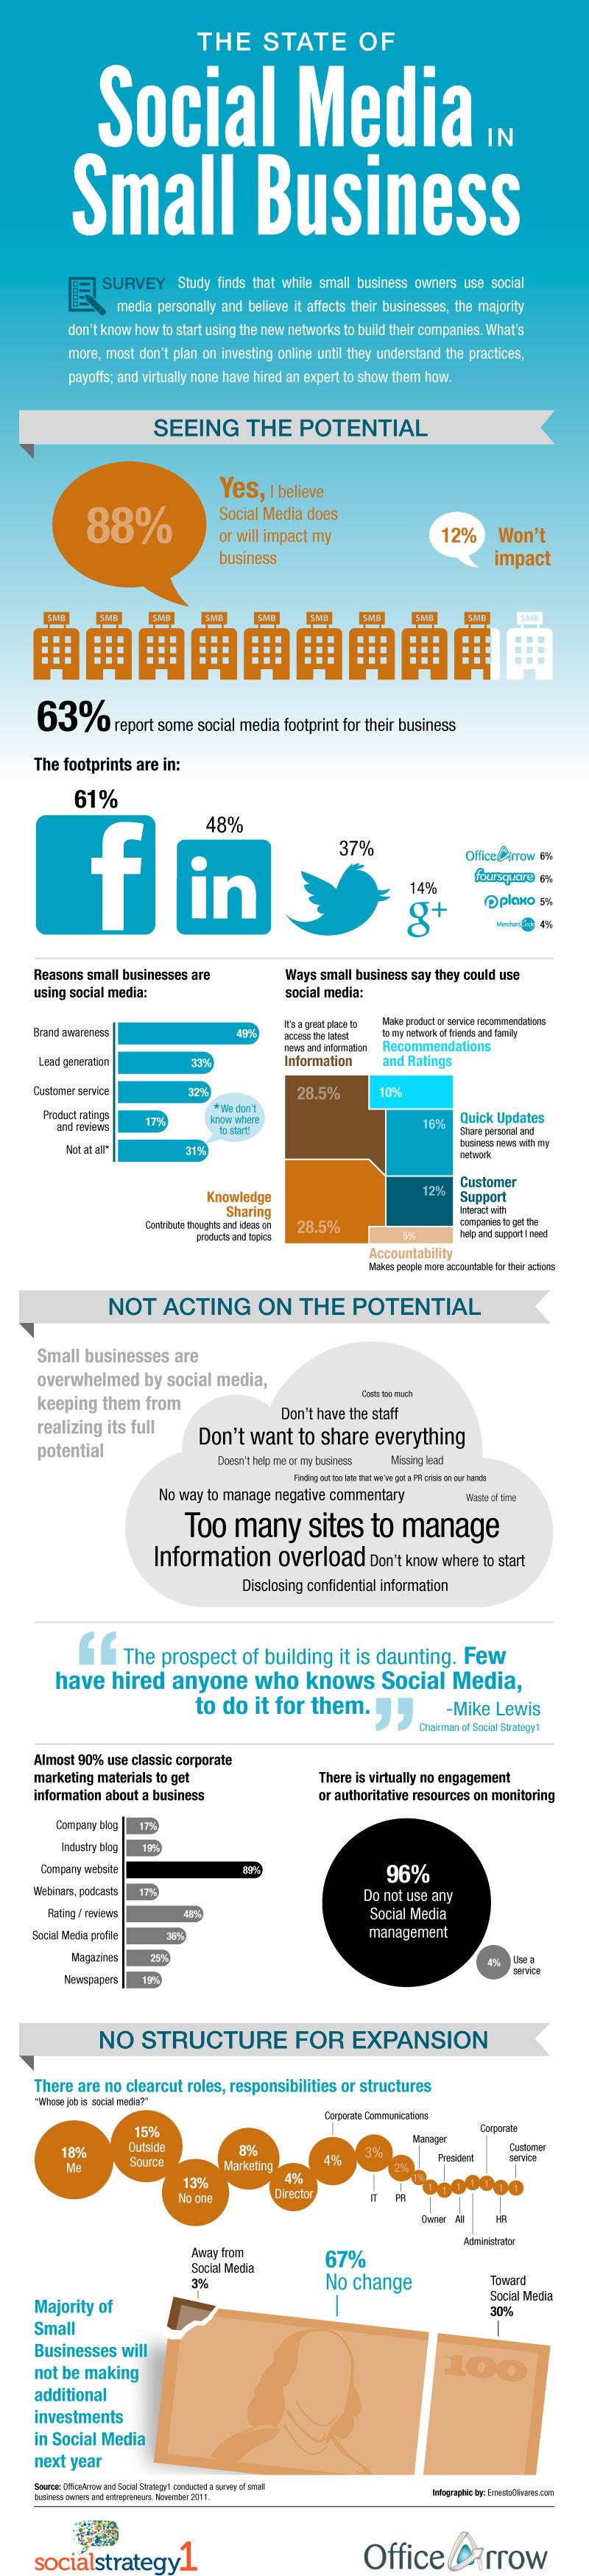 The Rising Need for Social Media Marketing